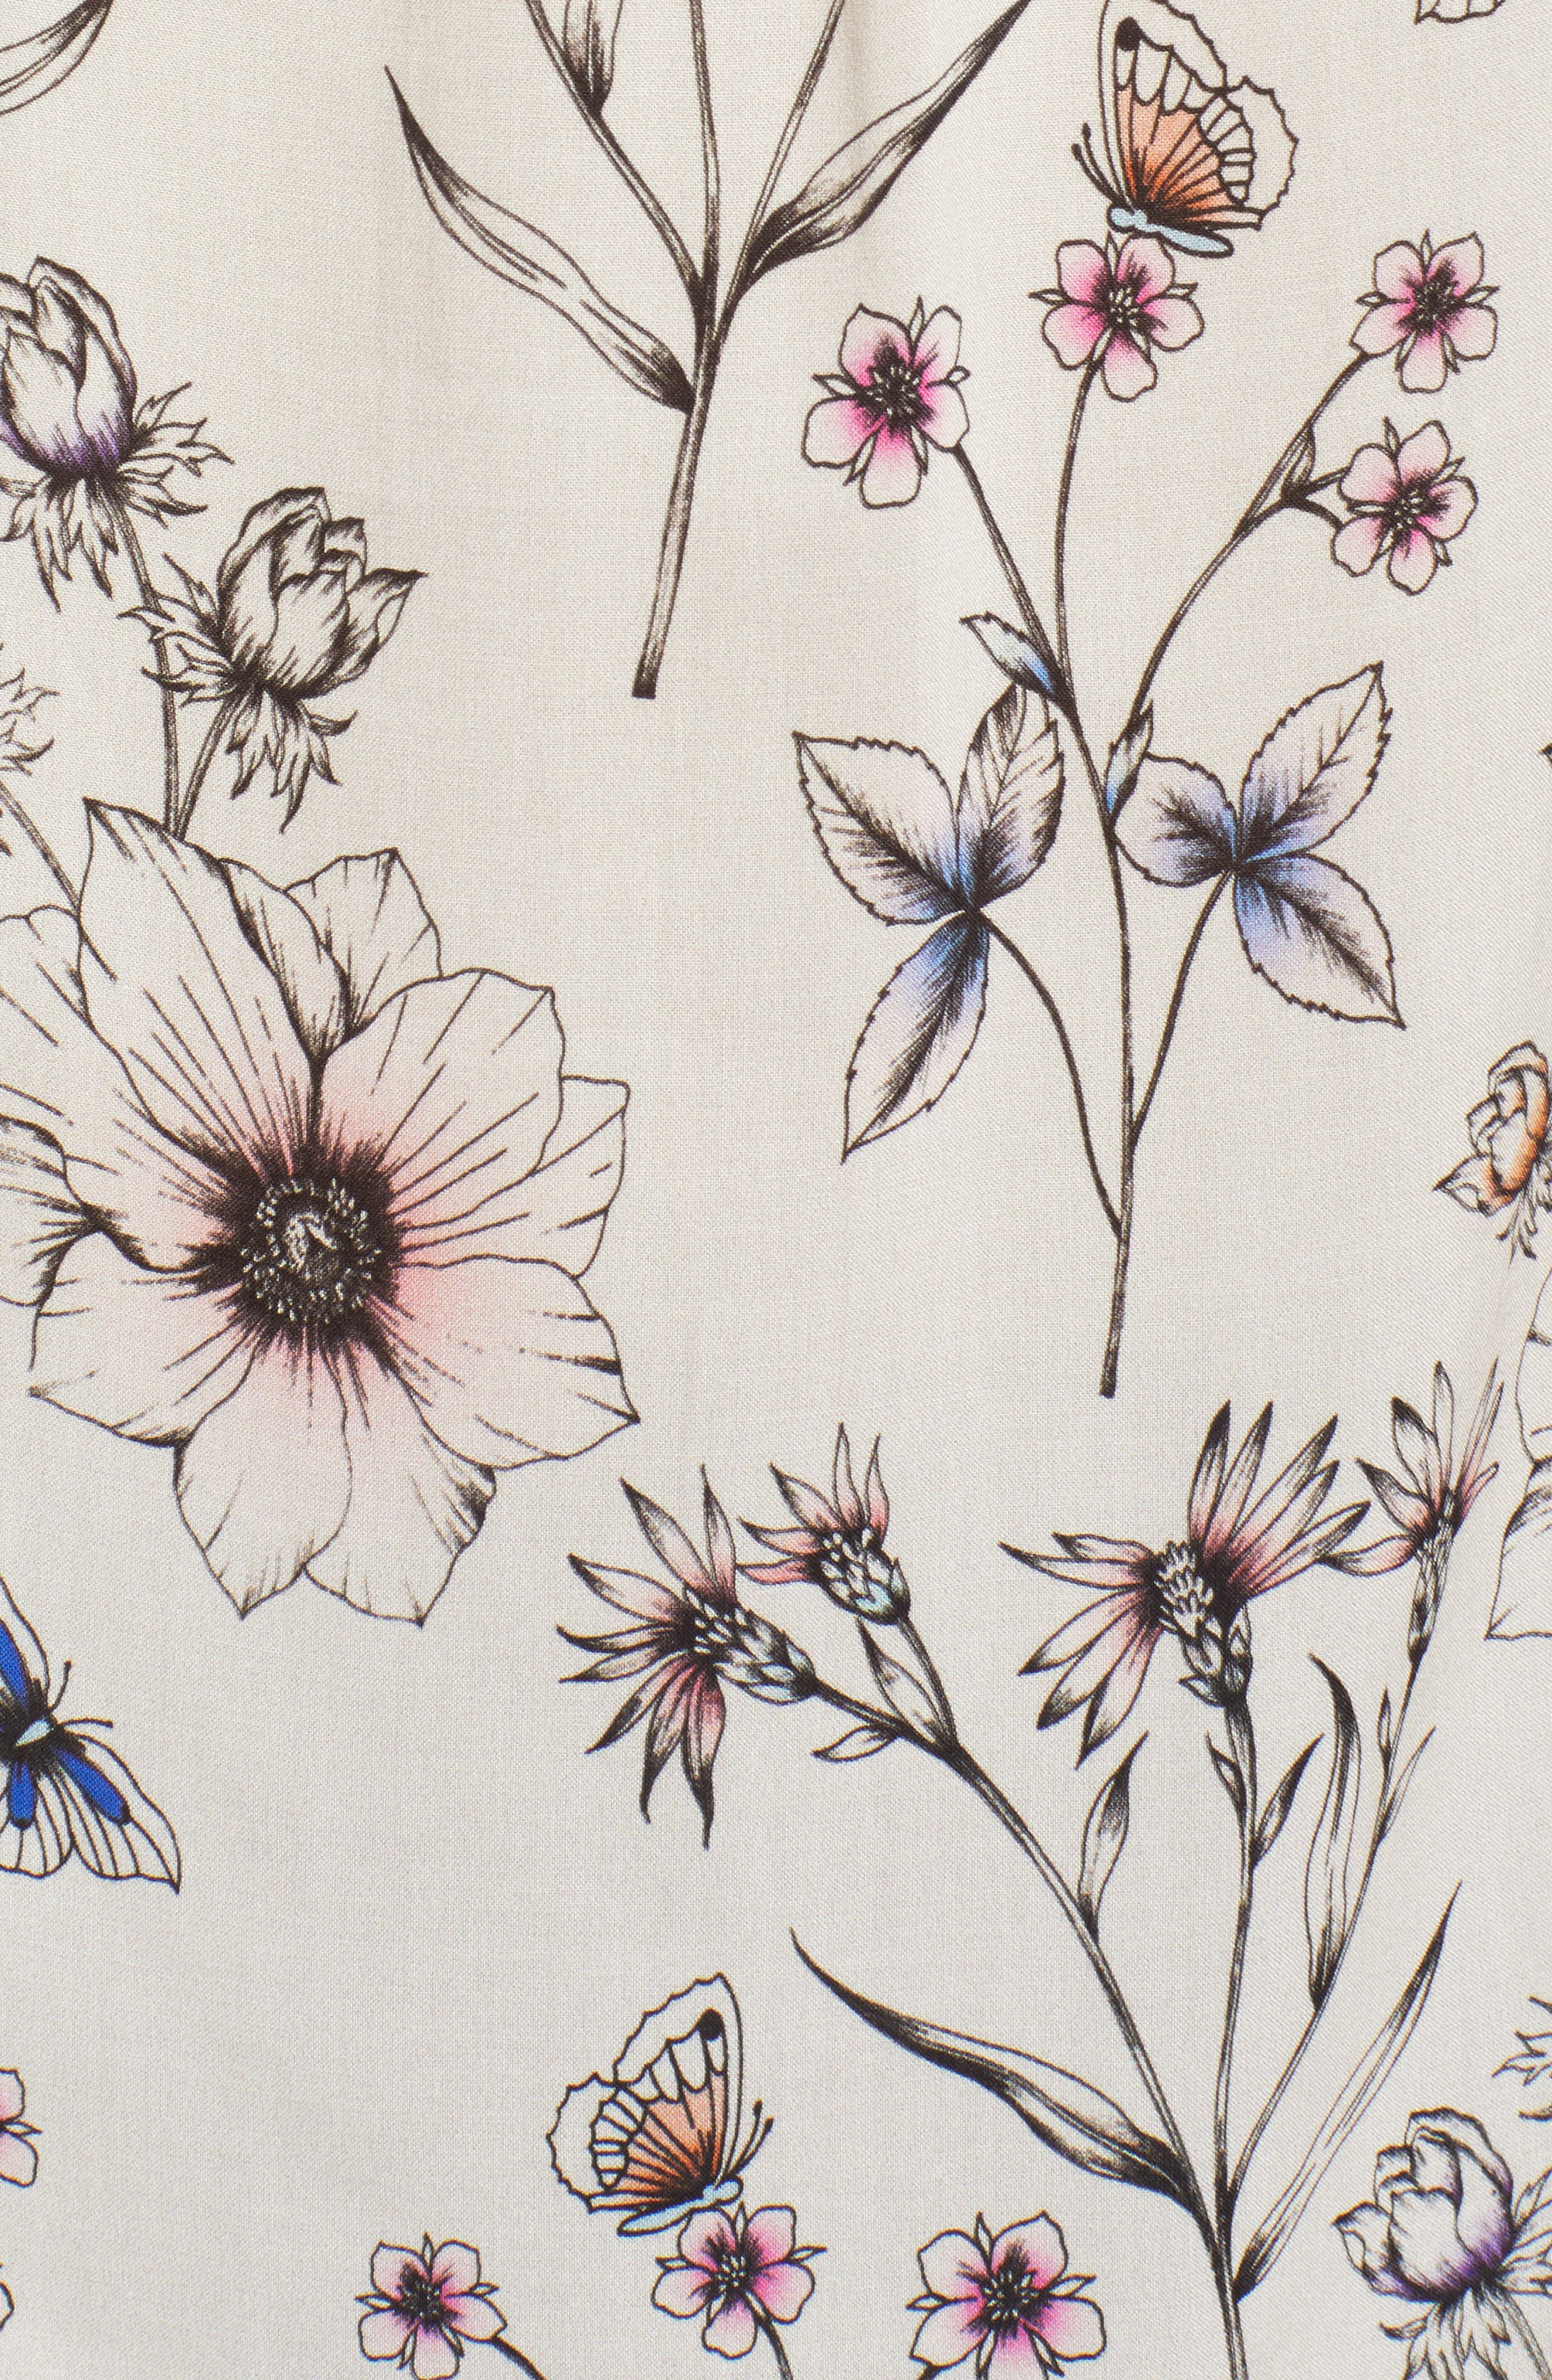 Floral Print Sleeveless Blouse,                             Alternate thumbnail 6, color,                             Flora